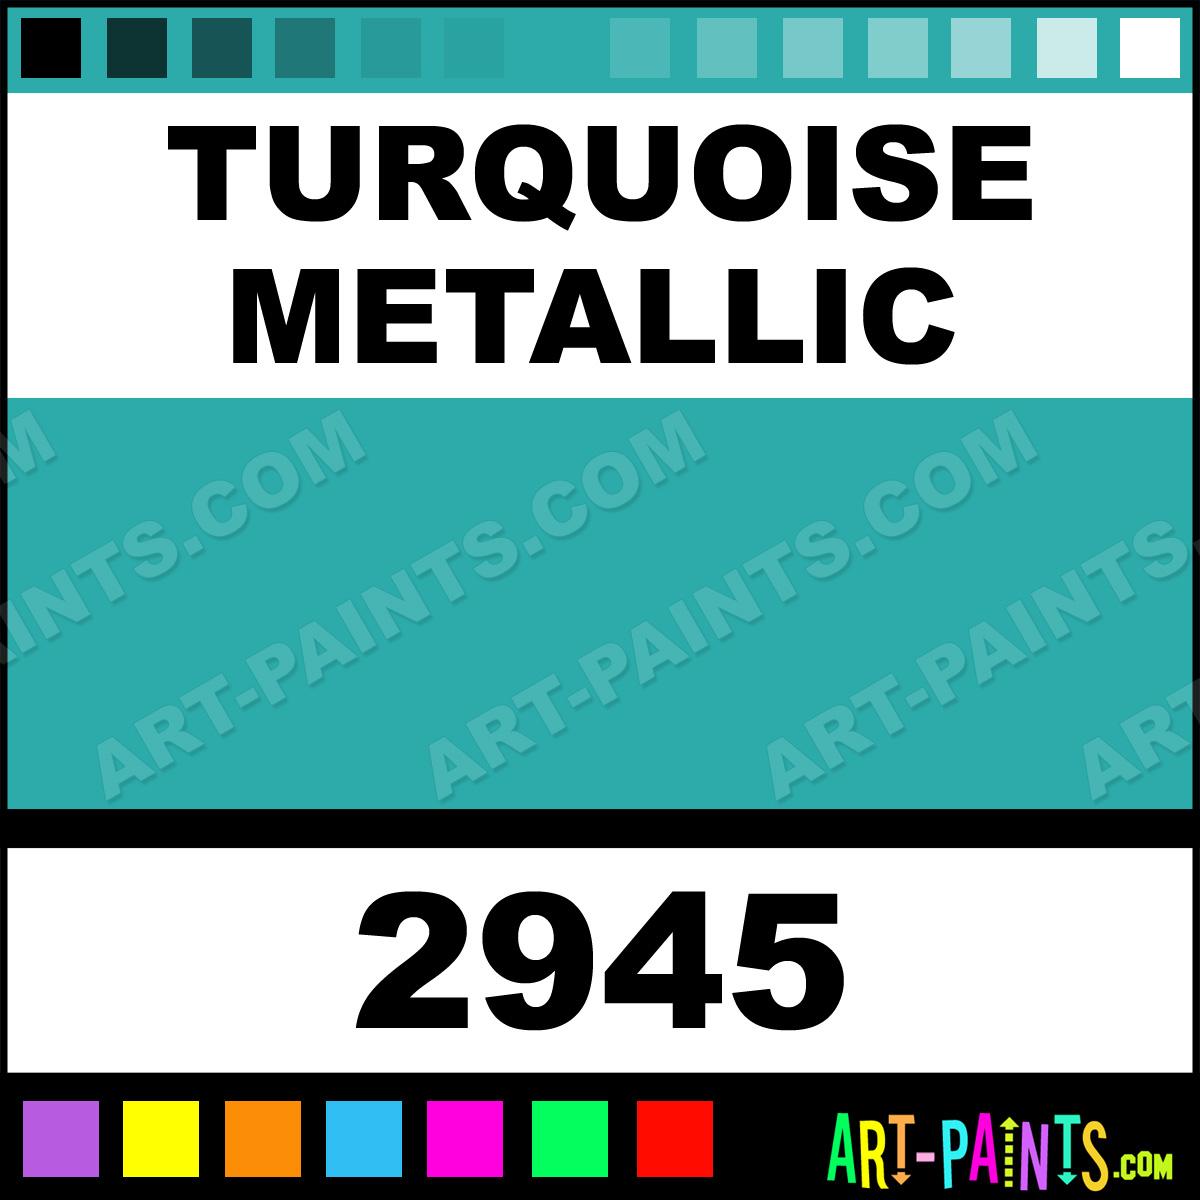 turquoise metallic car and truck enamel paints 2945. Black Bedroom Furniture Sets. Home Design Ideas